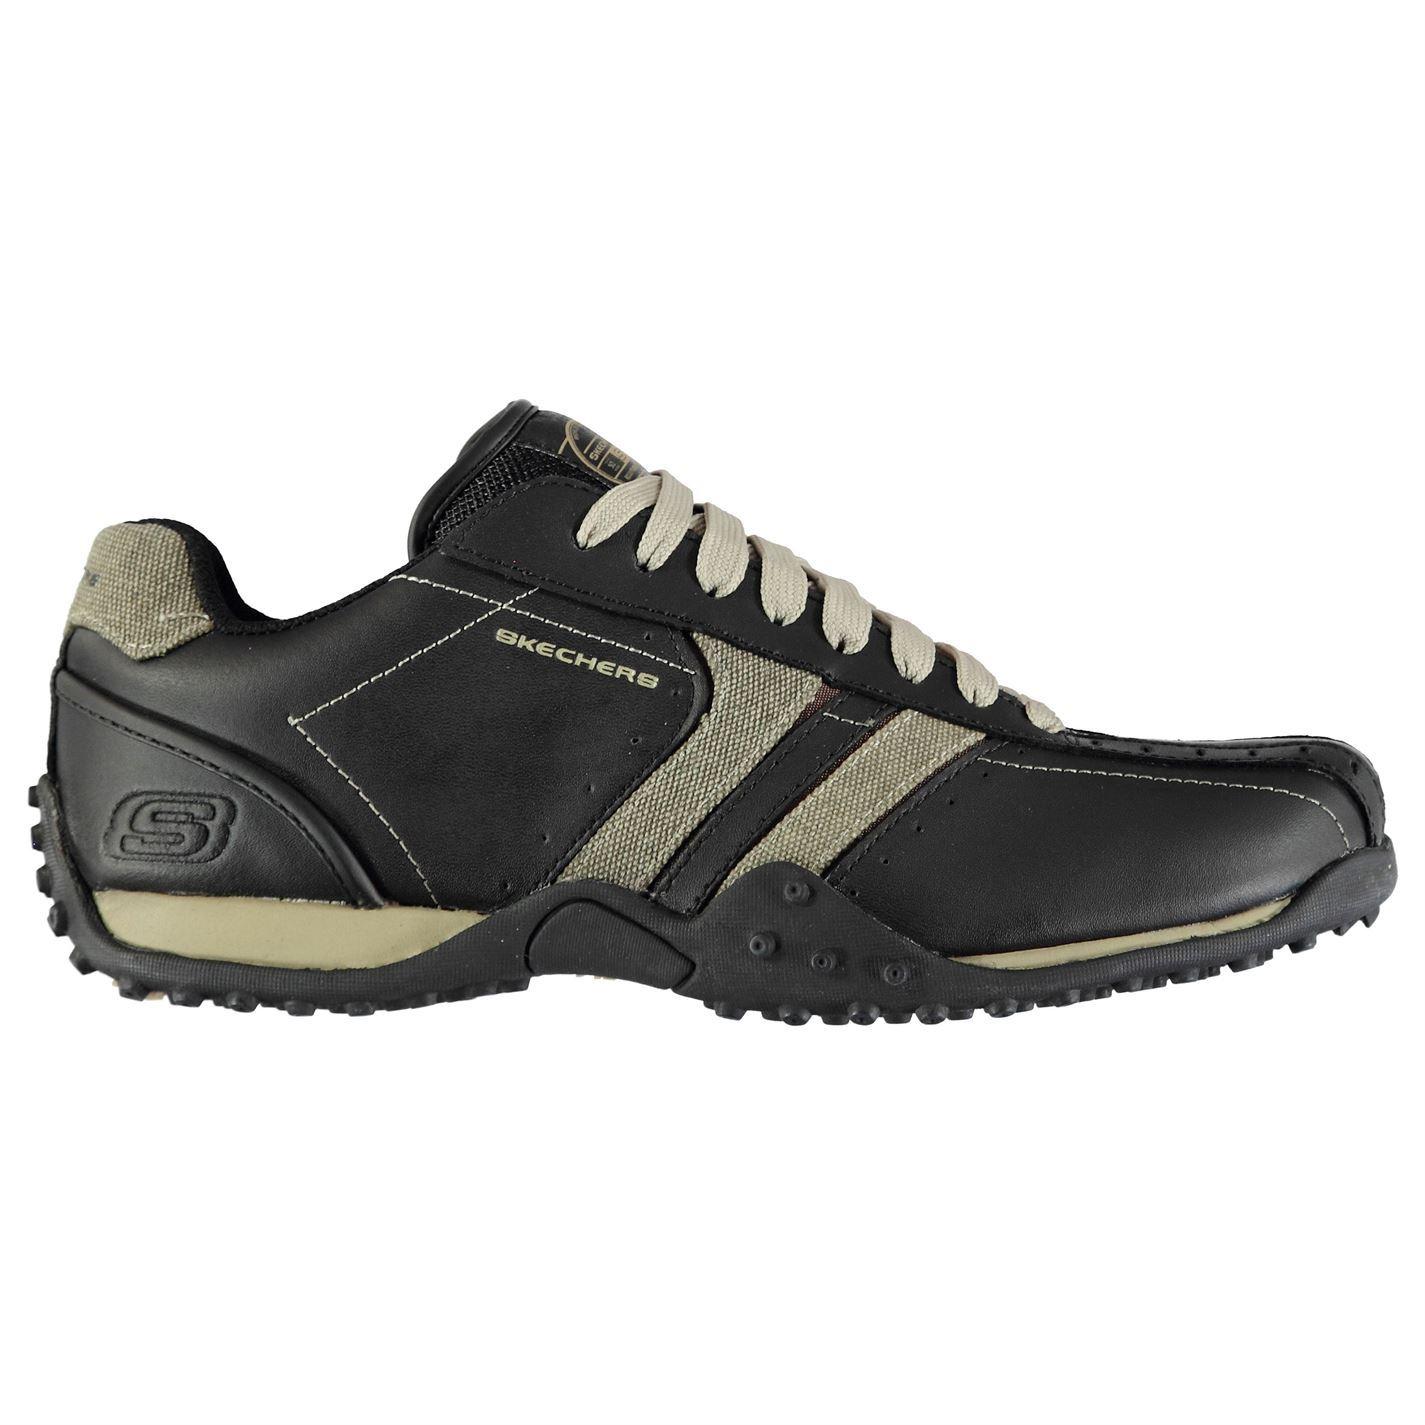 Skechers-Urban-Track-Forward-Trainers-Mens-Athleisure-Footwear-Shoes-Sneakers thumbnail 4